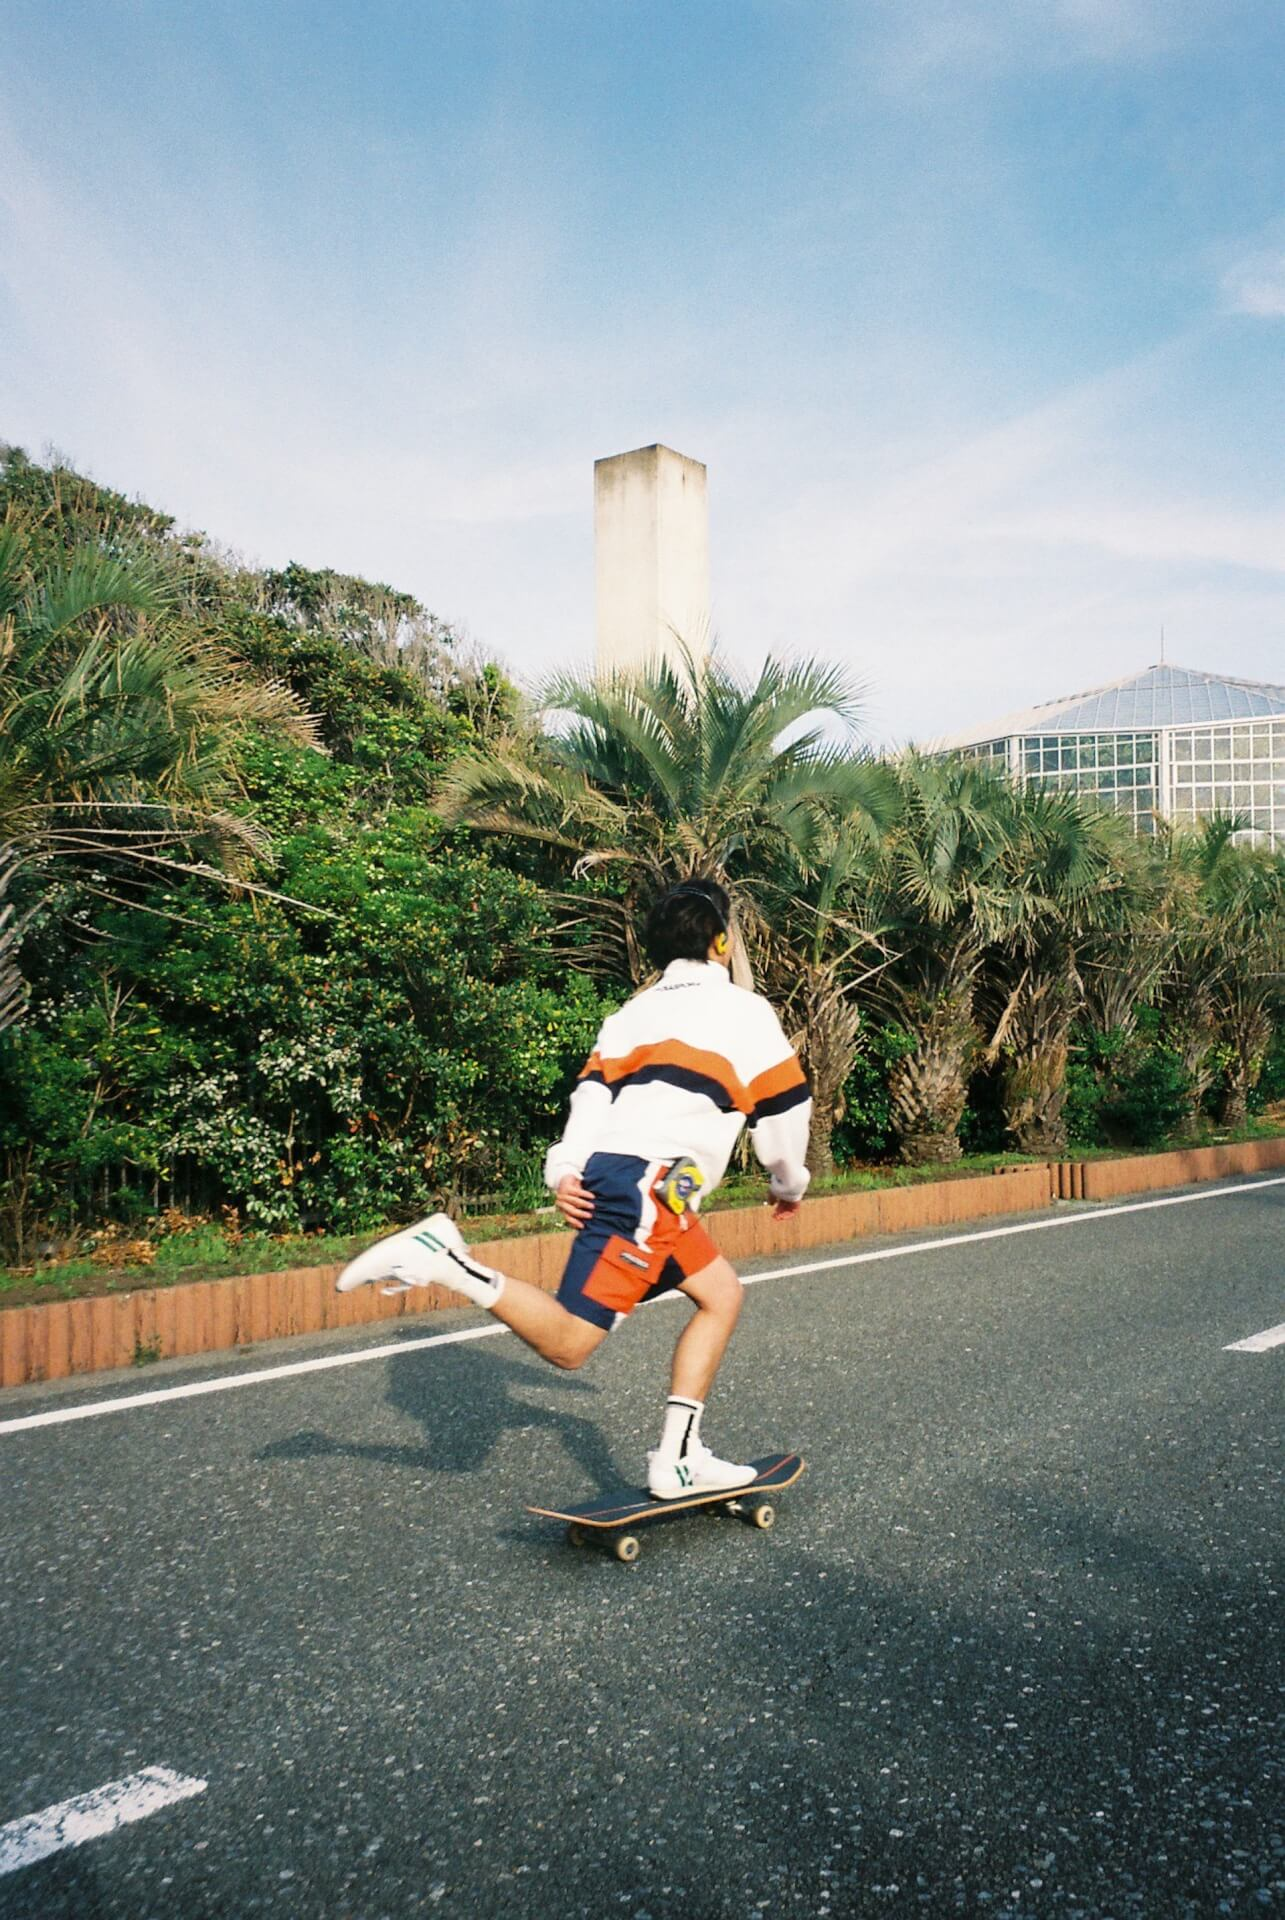 Diaspora skateboardsがフランス発祥のシューズブランド・PATRICKとのカプセルコレクションを明日販売開始! fashion210423_diasporaskateboards-04